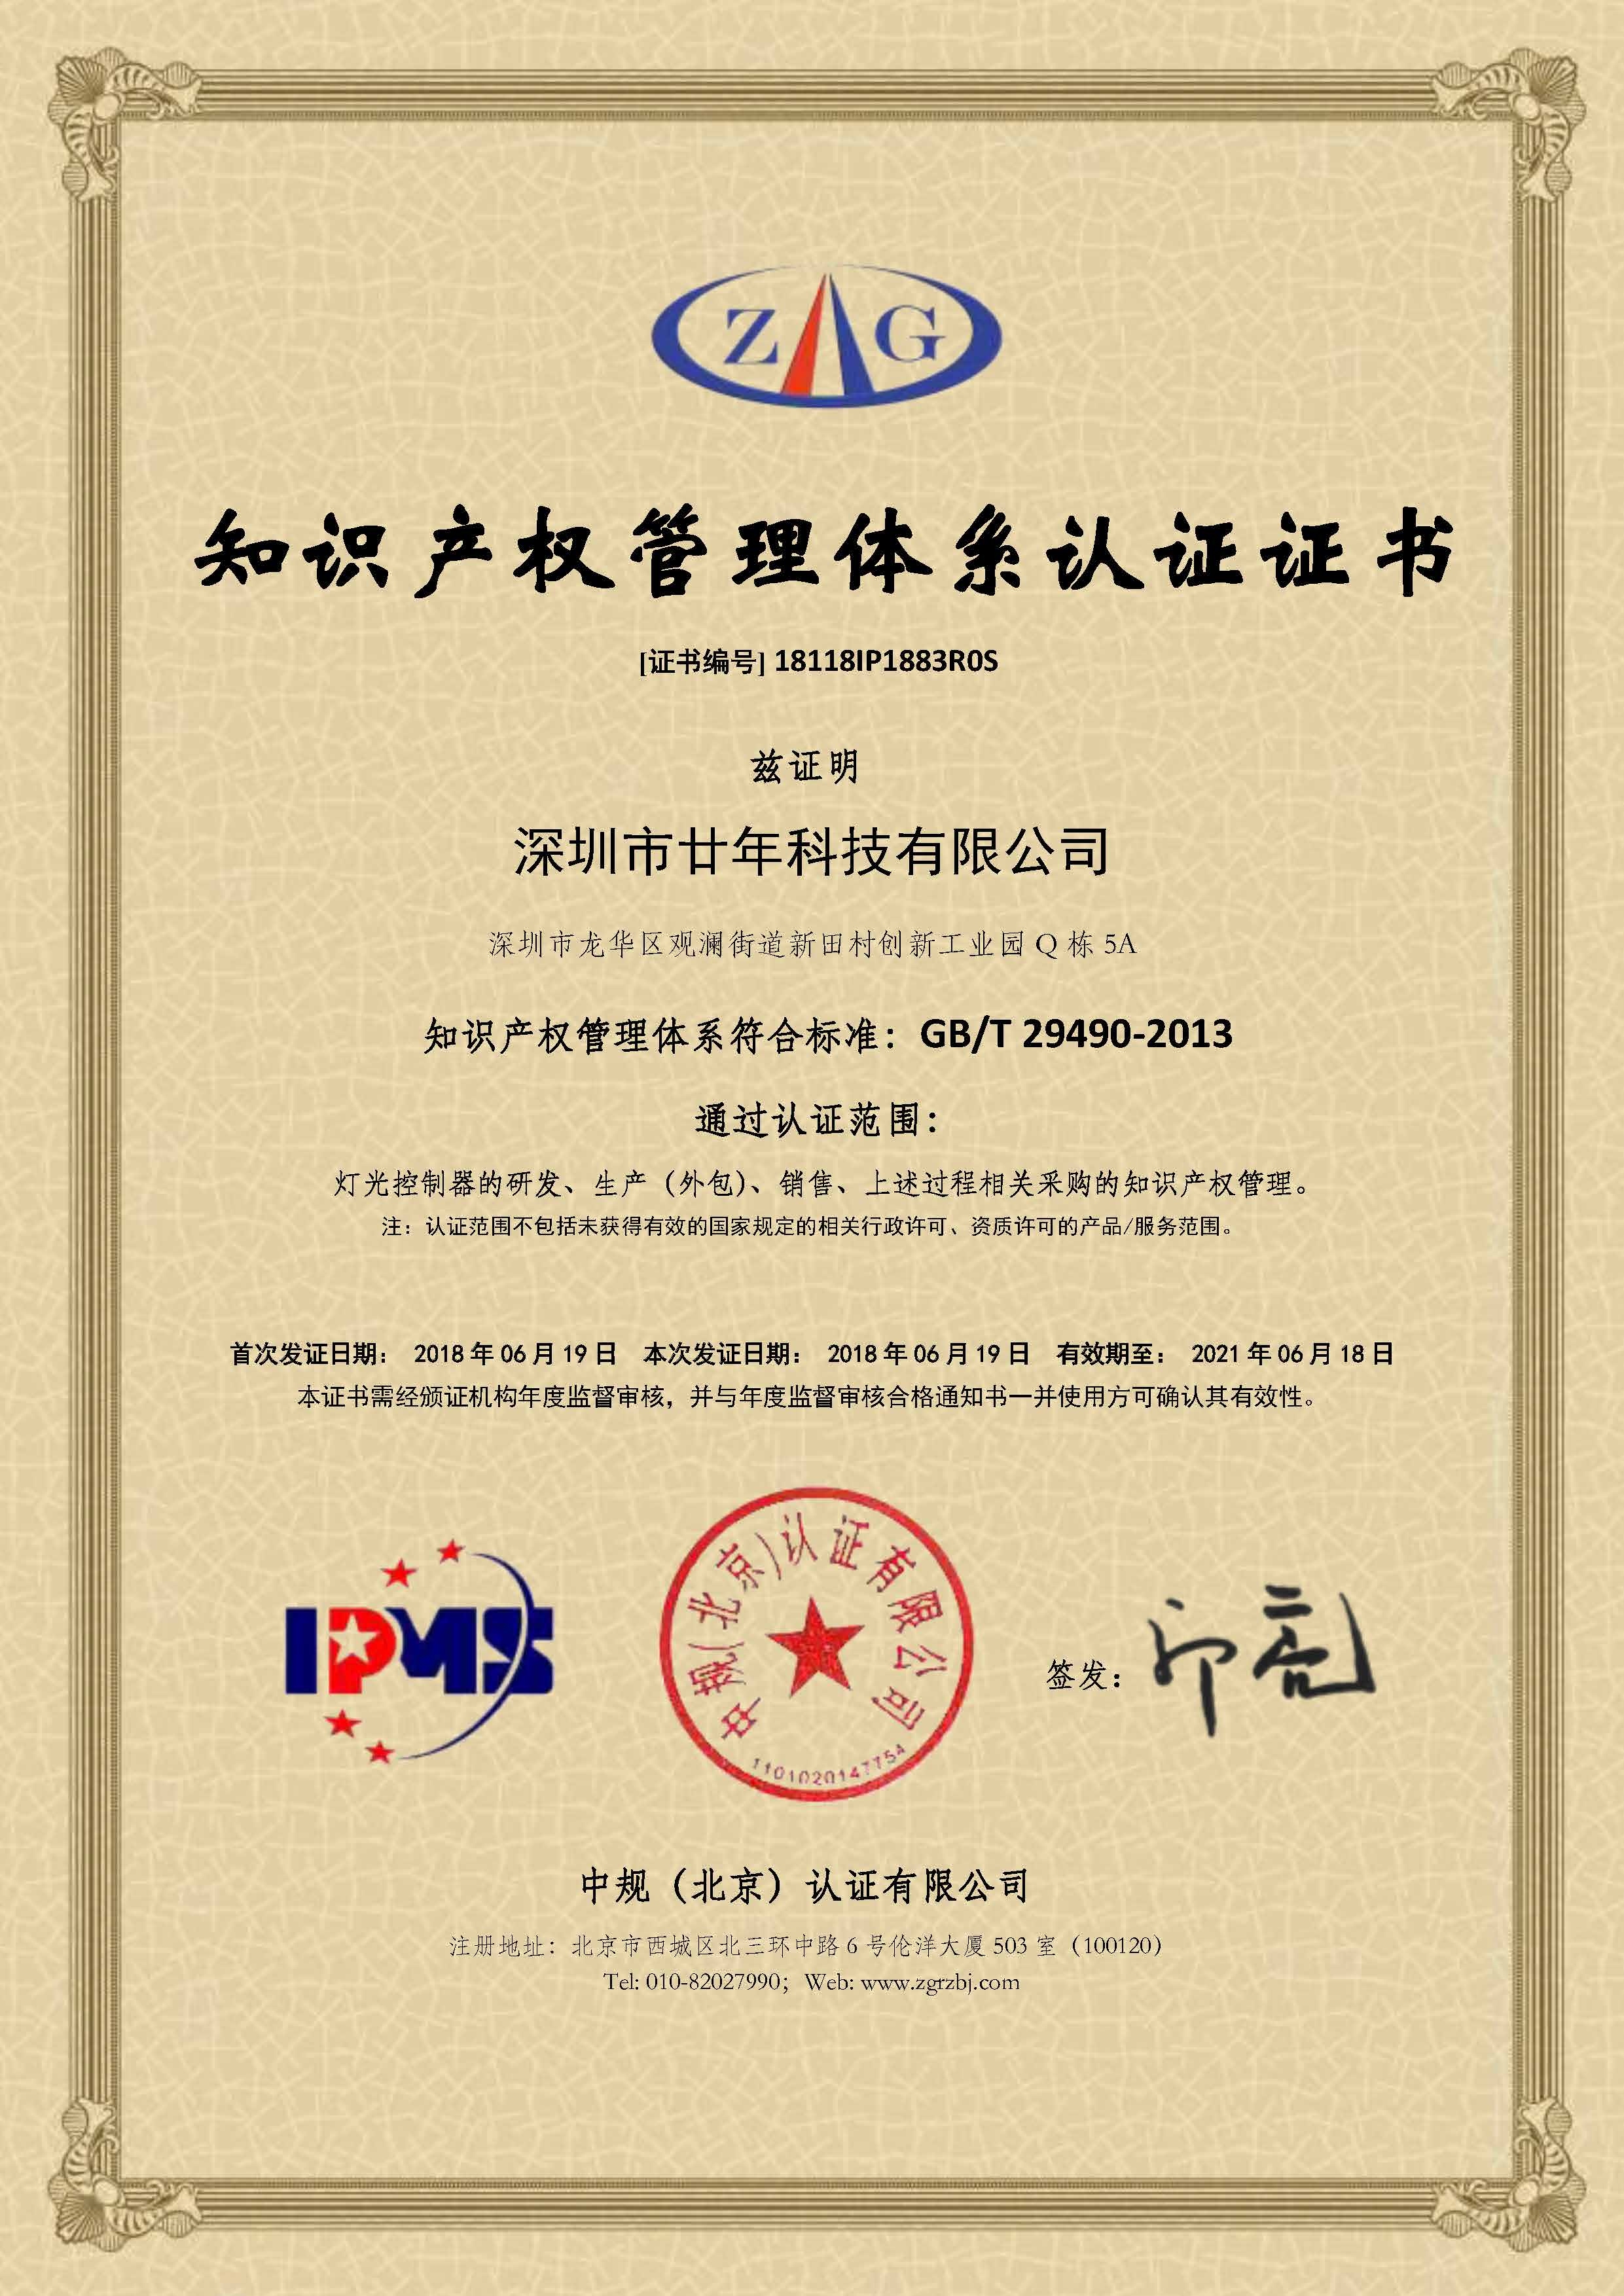 18118IP1883R0S深圳市廿年科技有限公司.jpg